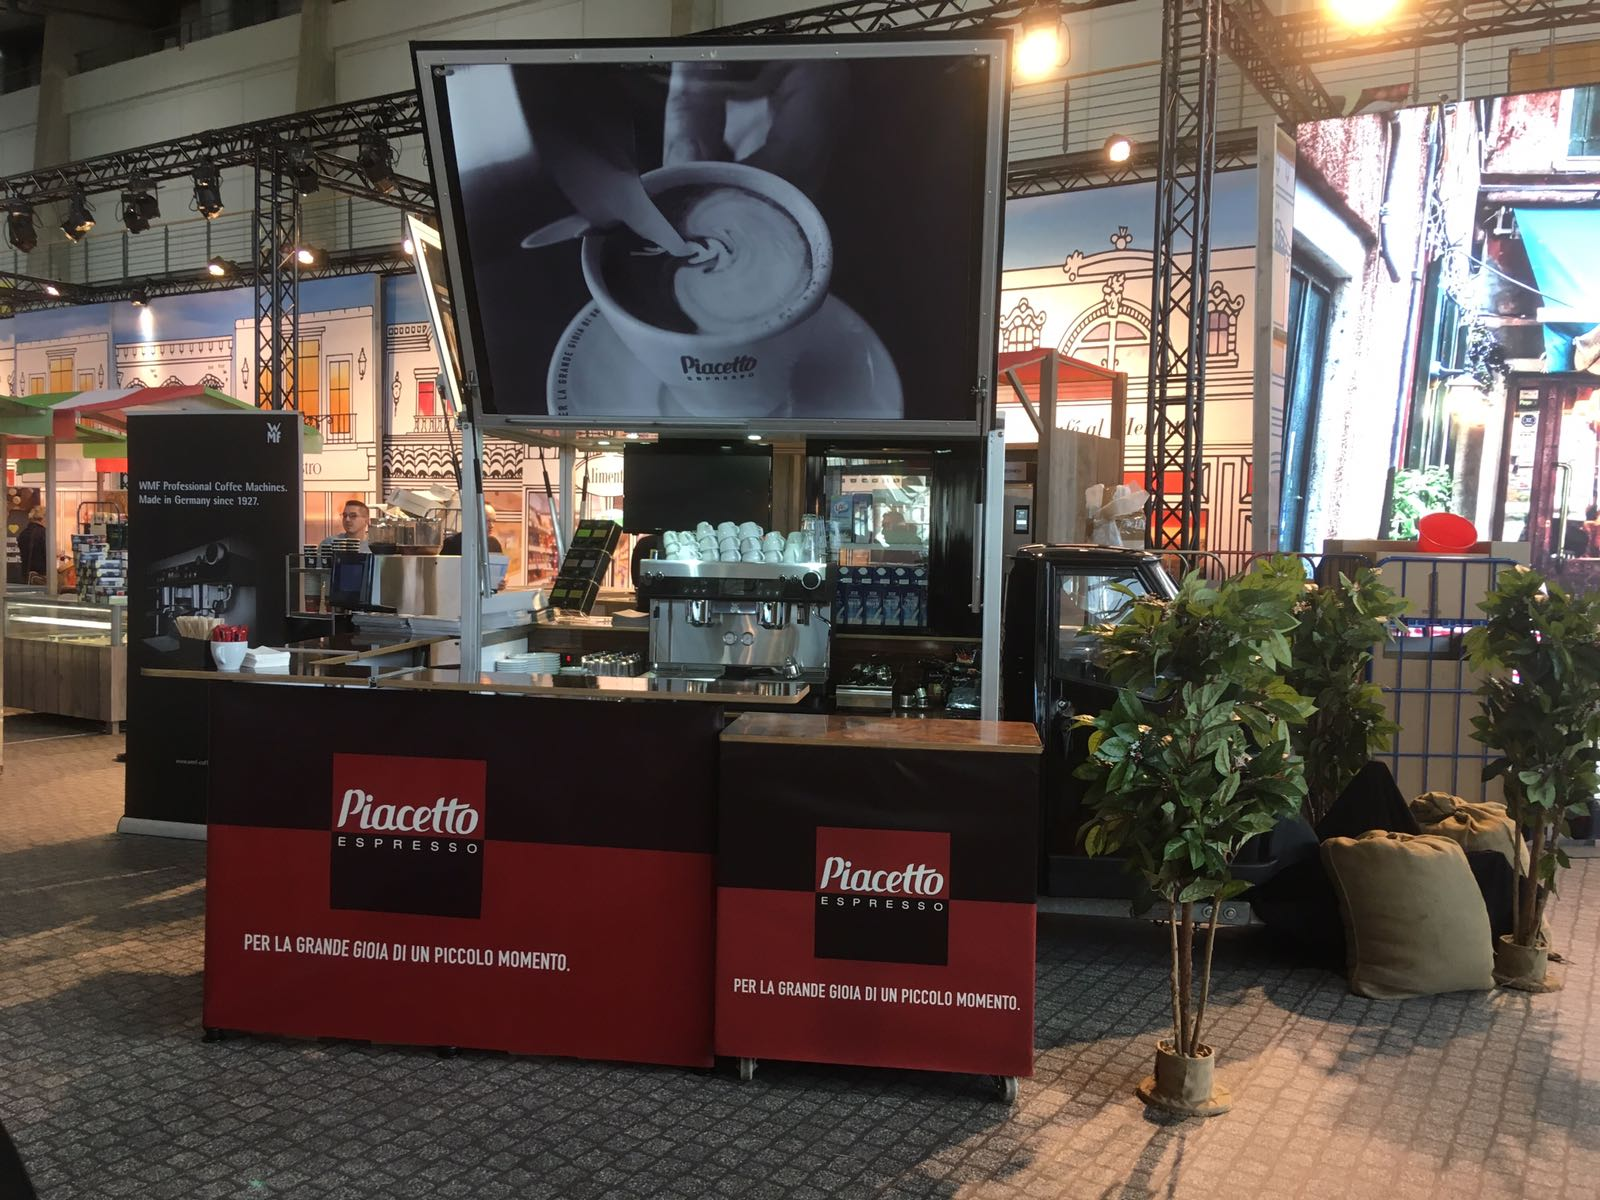 Piachetto Ape1200 Espressomobil im Promotion Einsatz